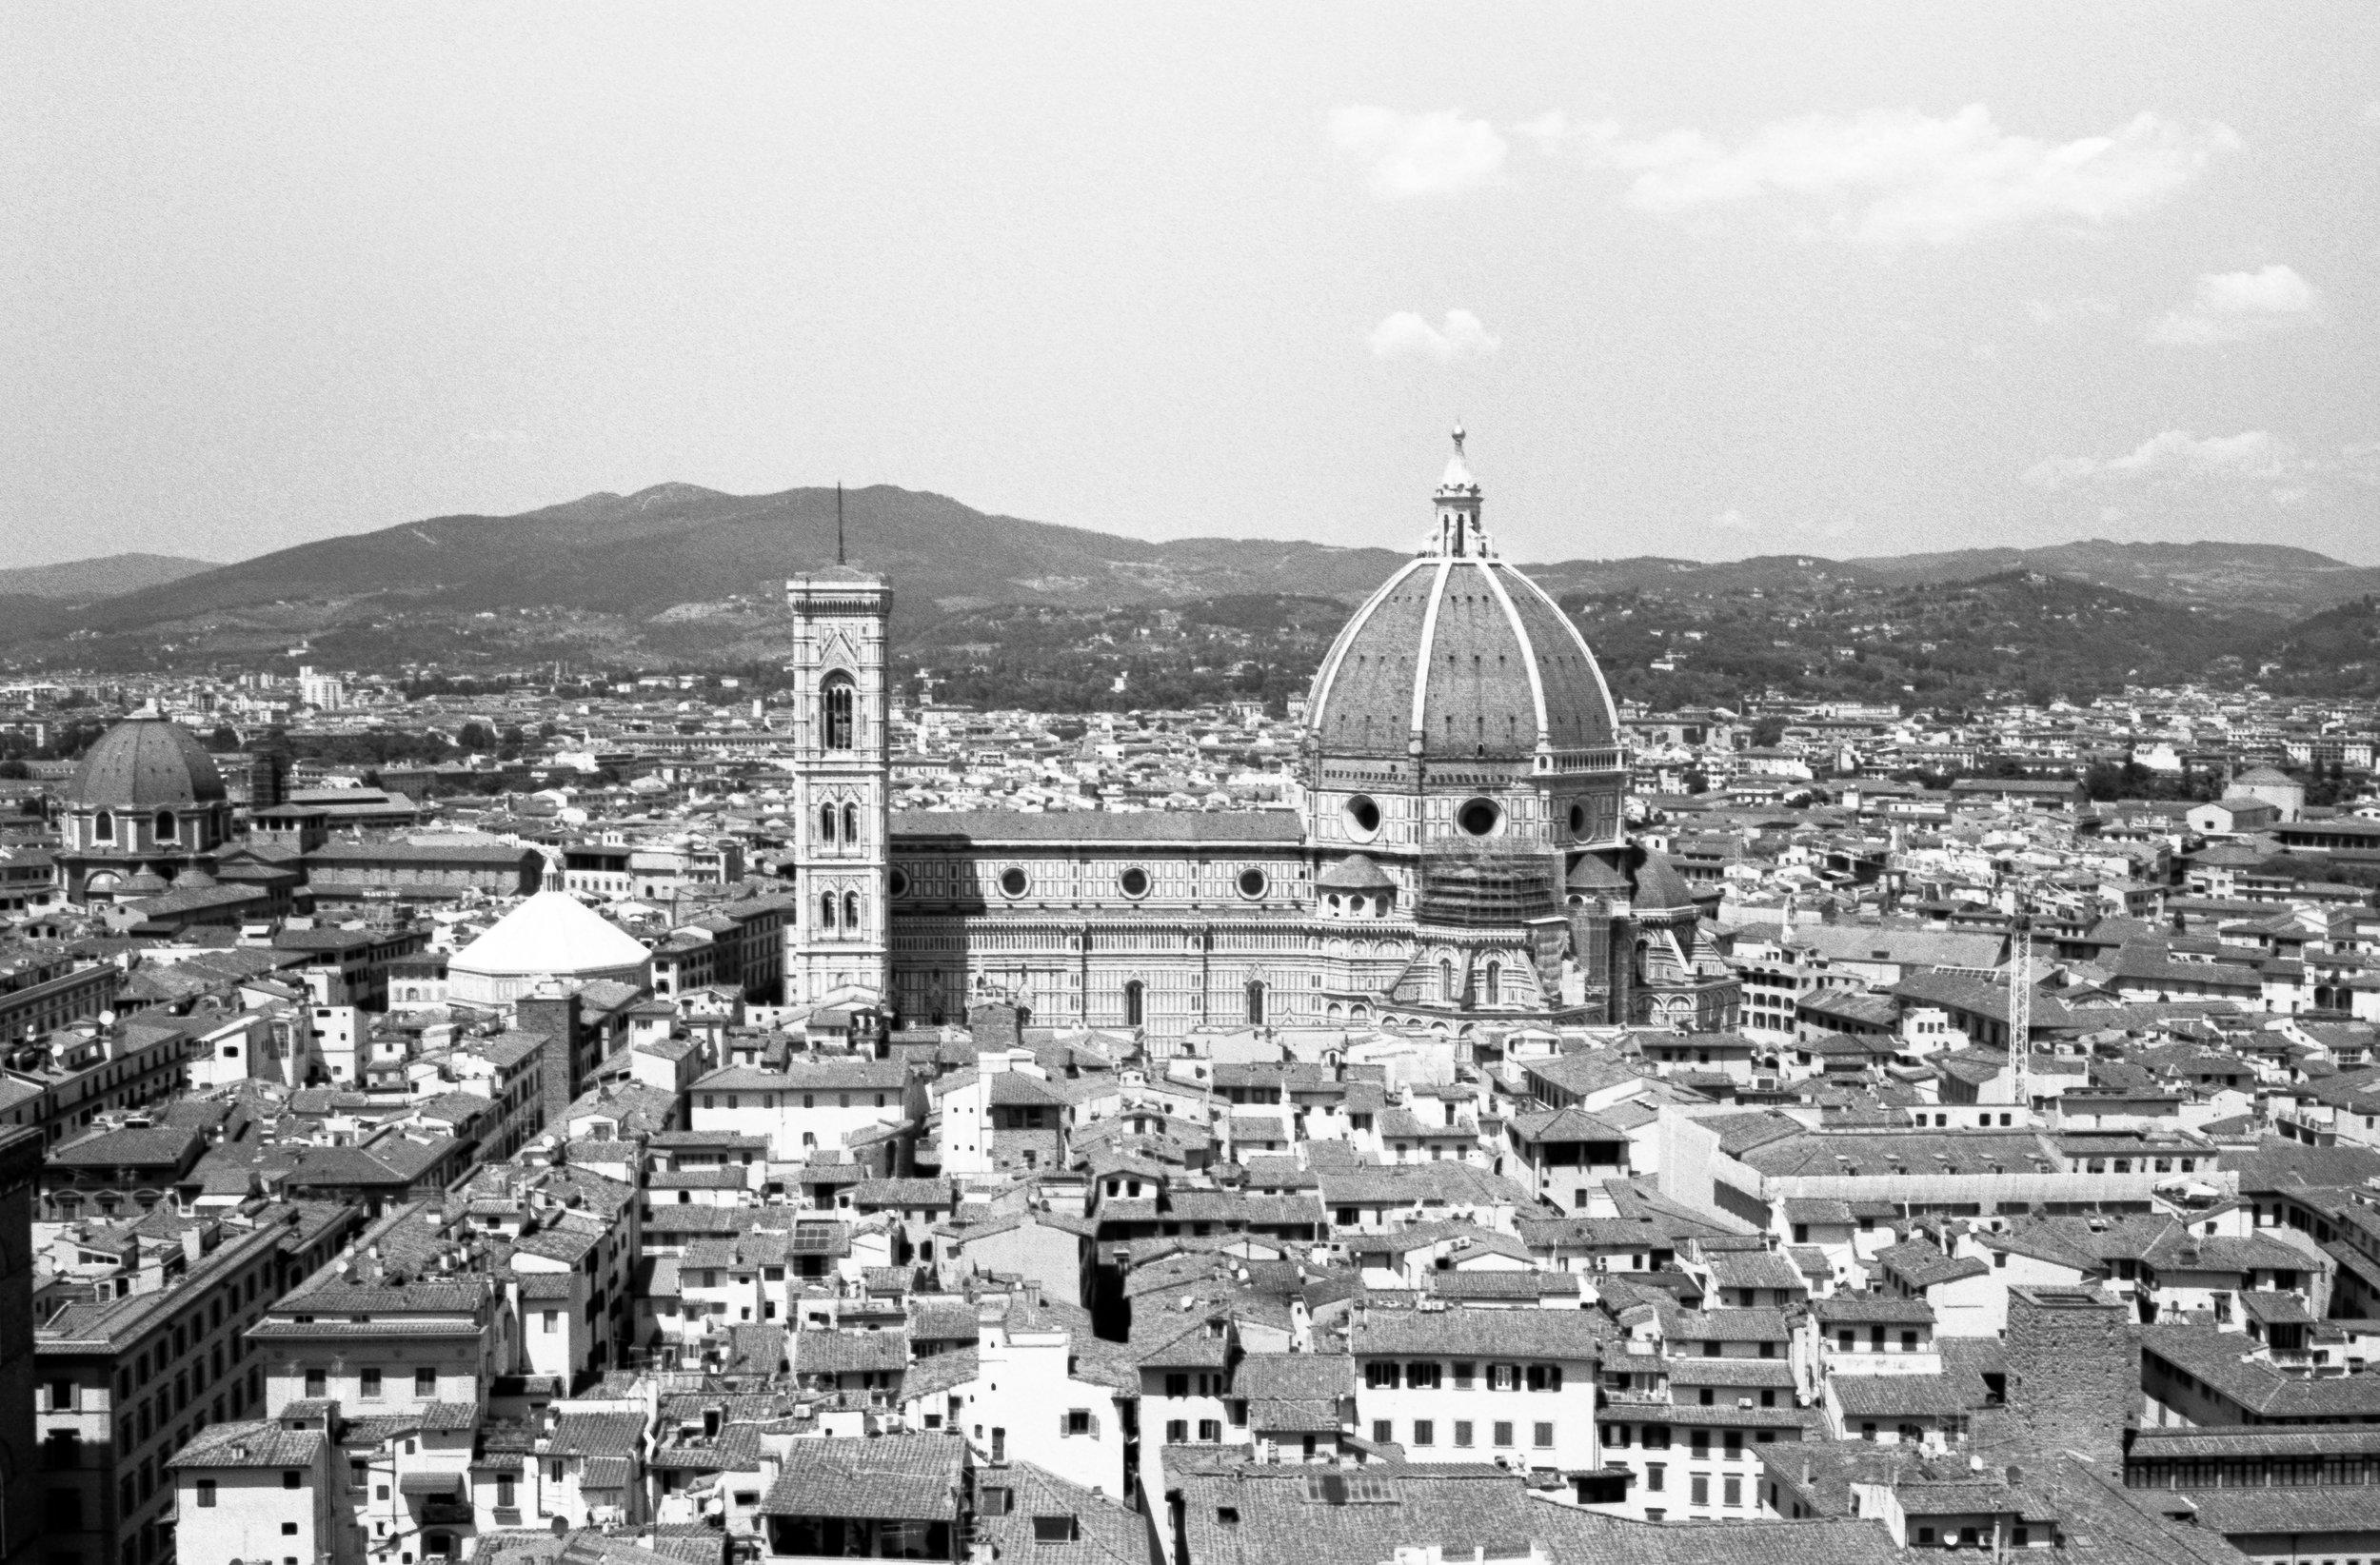 Cathedral of Santa Maria, Florence. Italy. 2019.